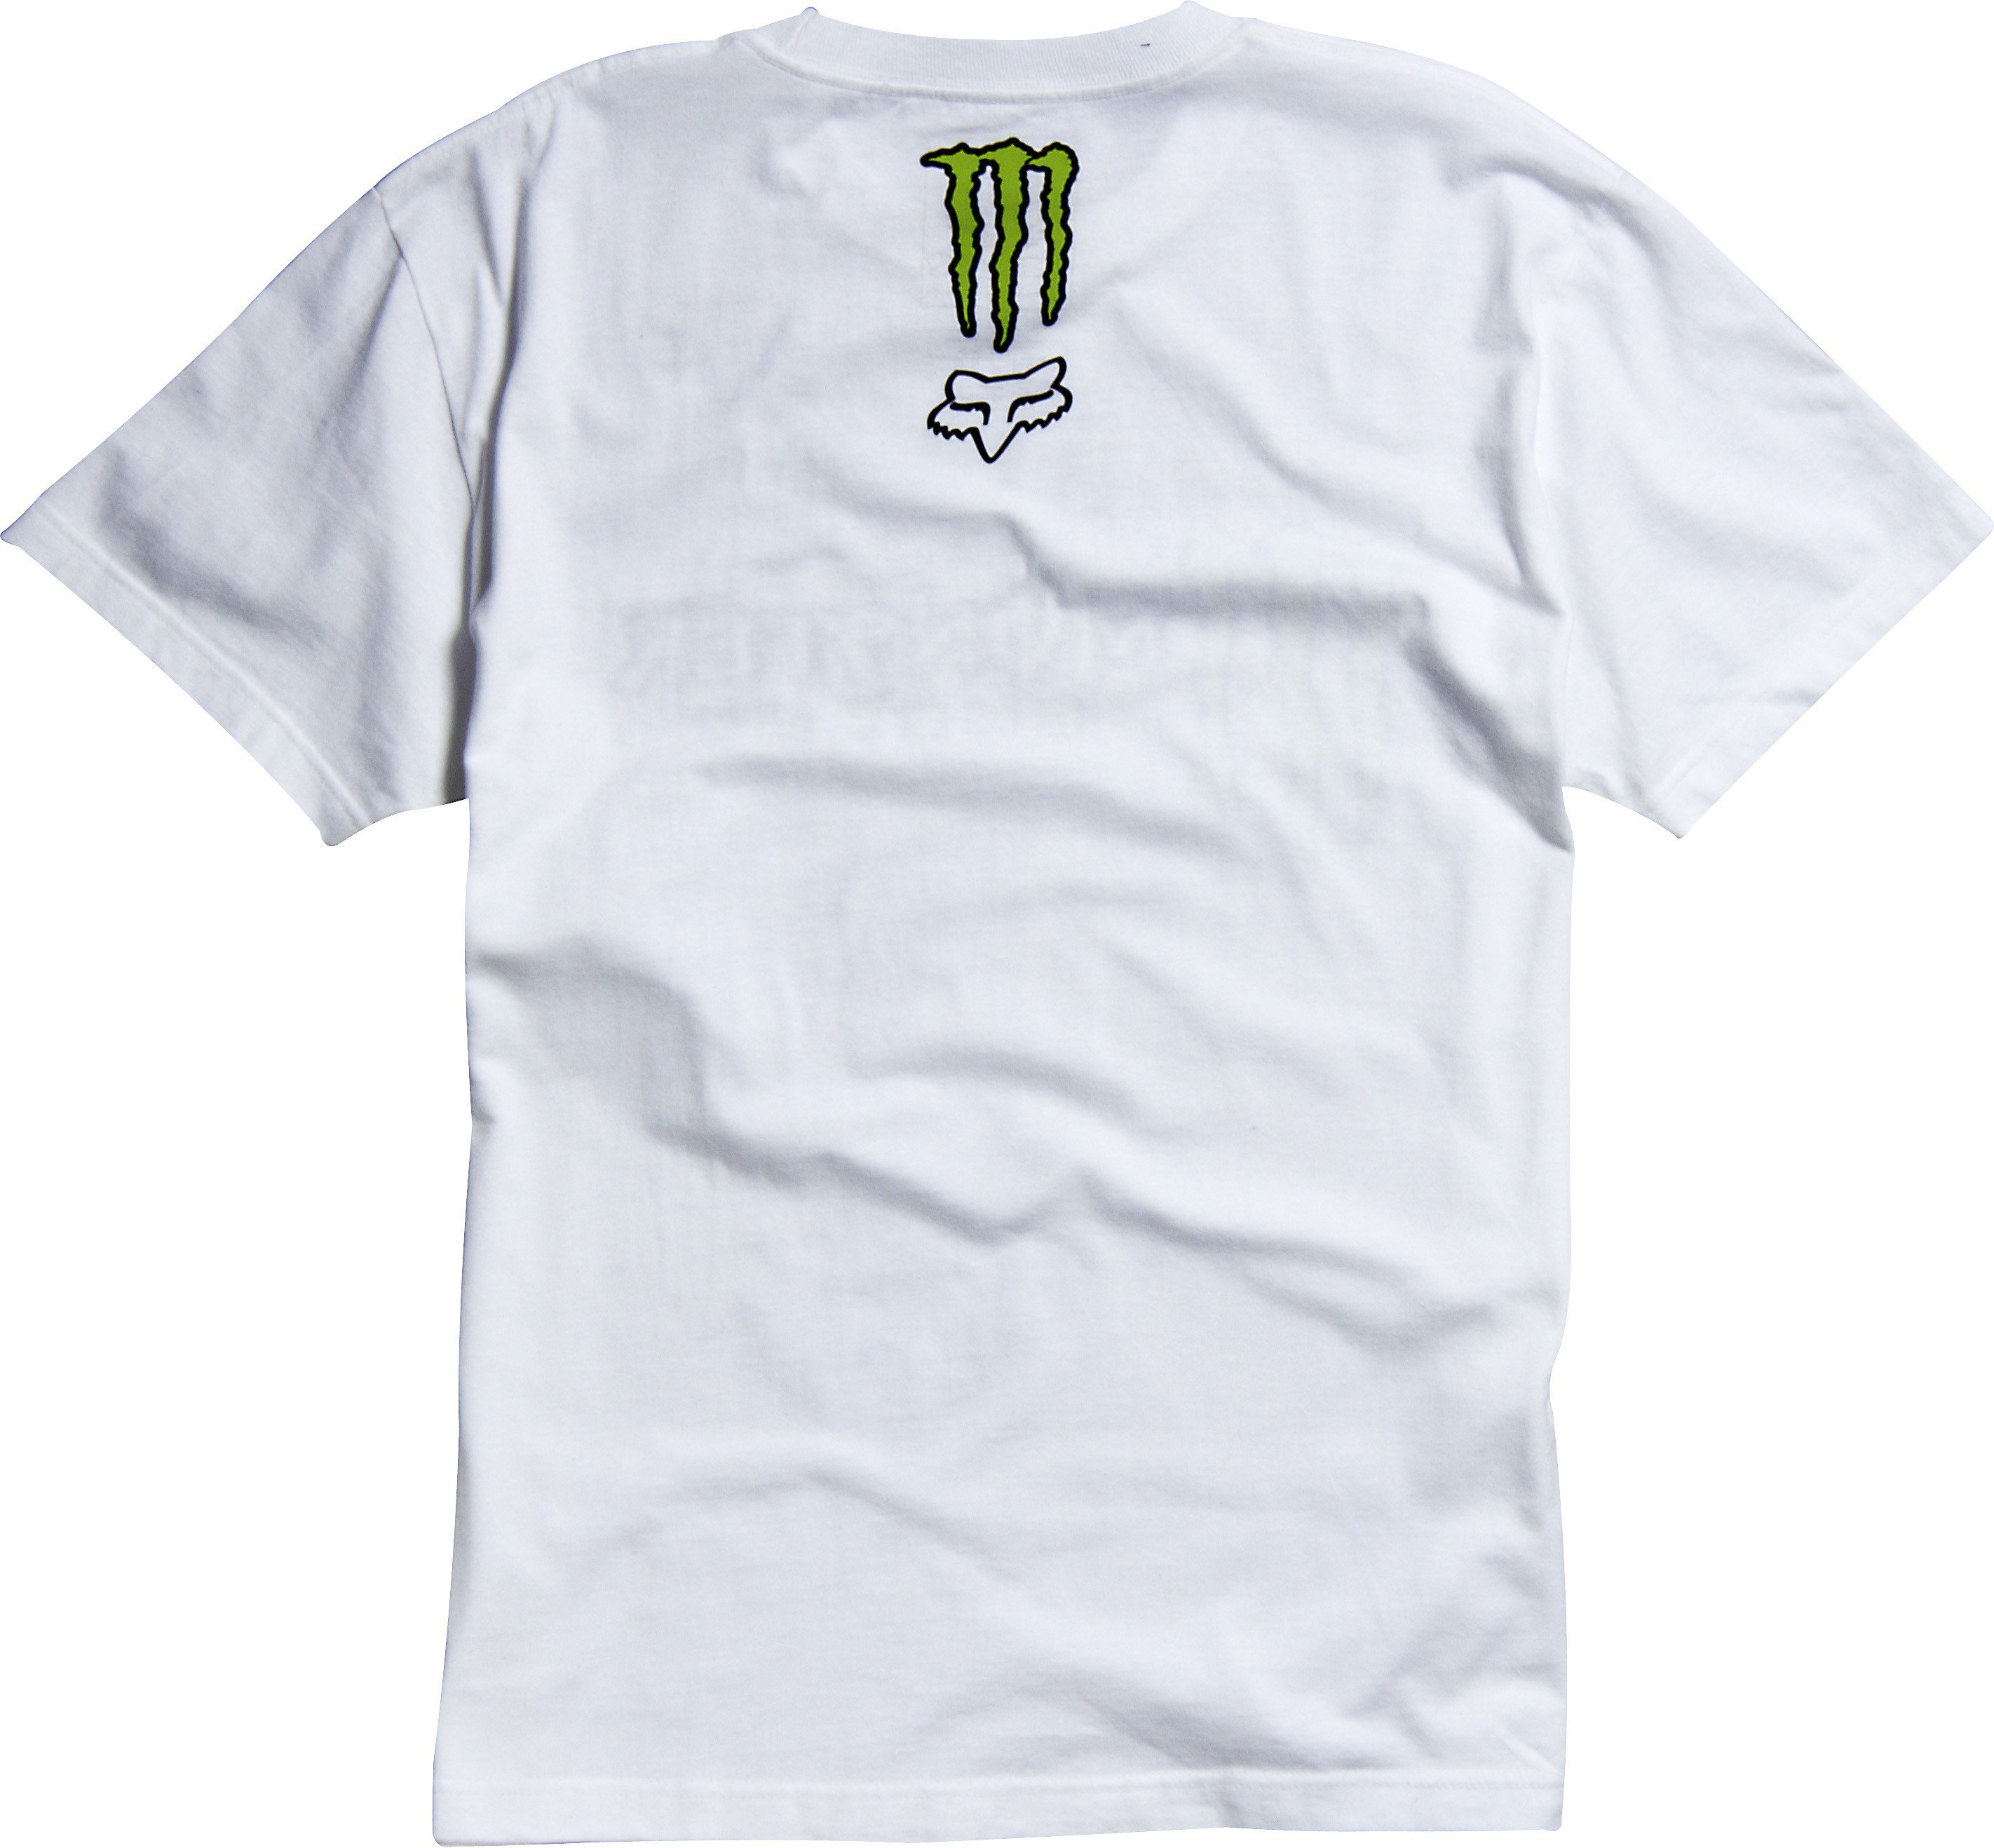 03af5752214 Tričko pánské FOX Monster RC Replica bílé - velikost L